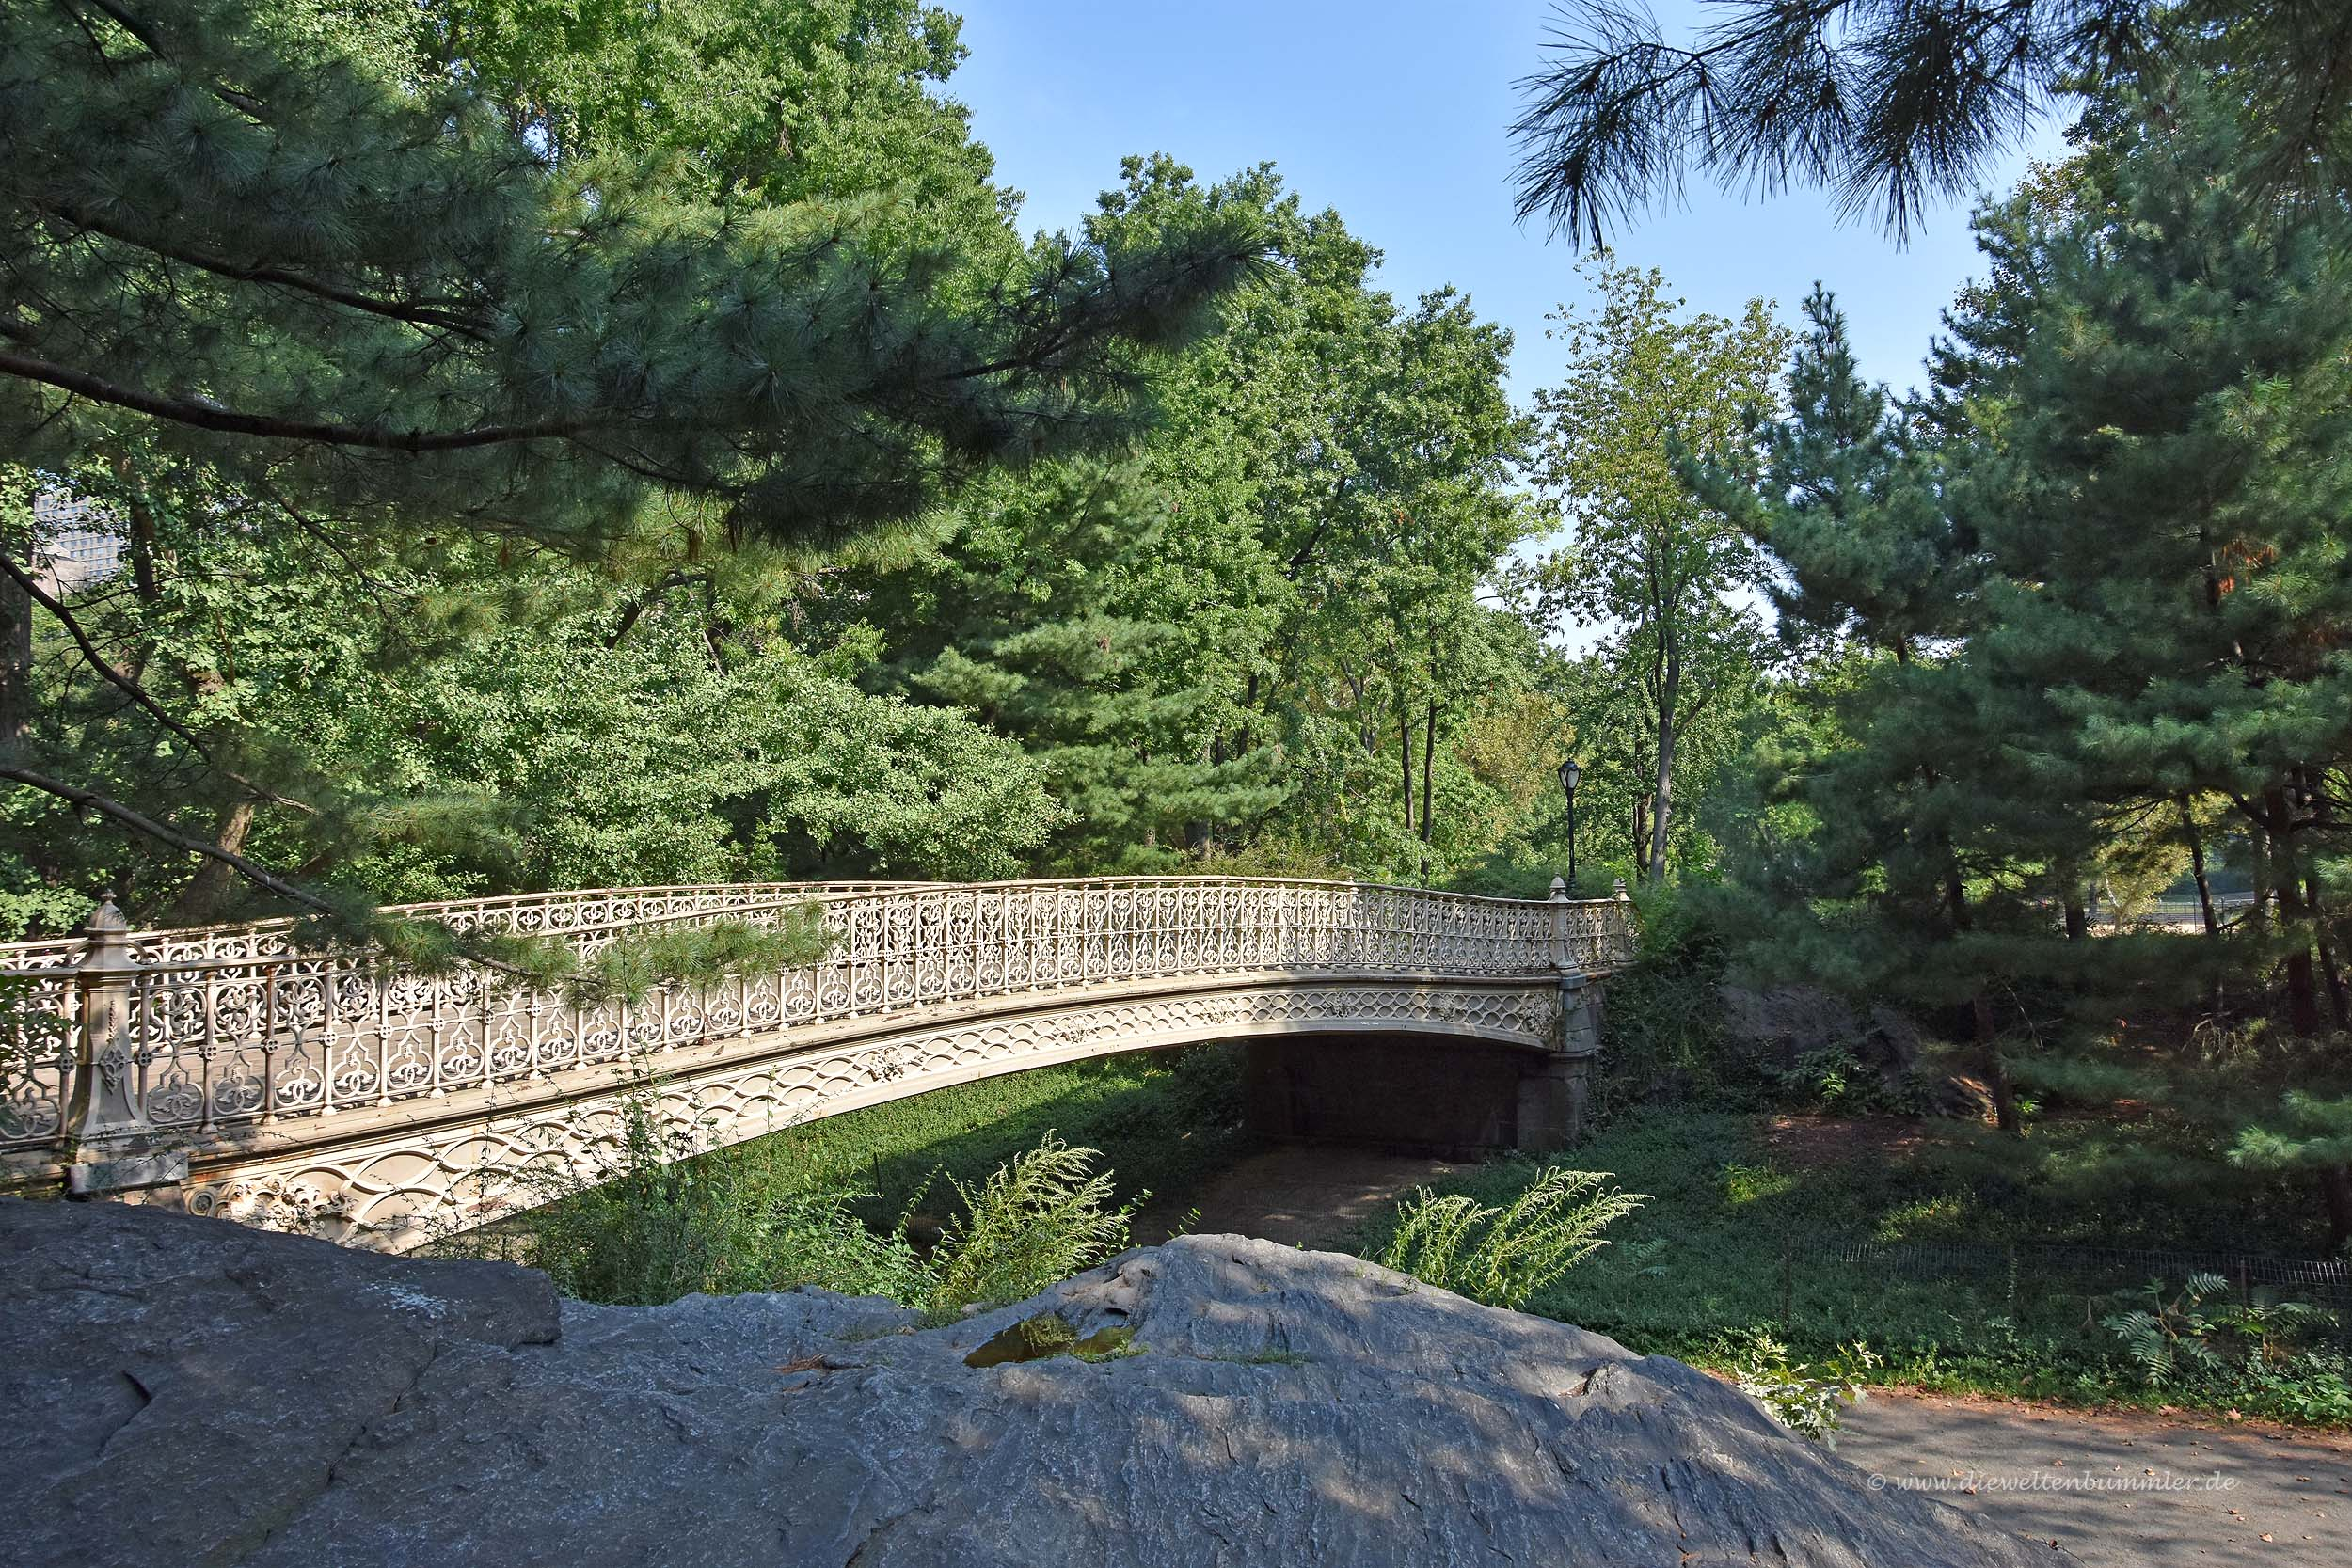 Holzbrücke im Central Park